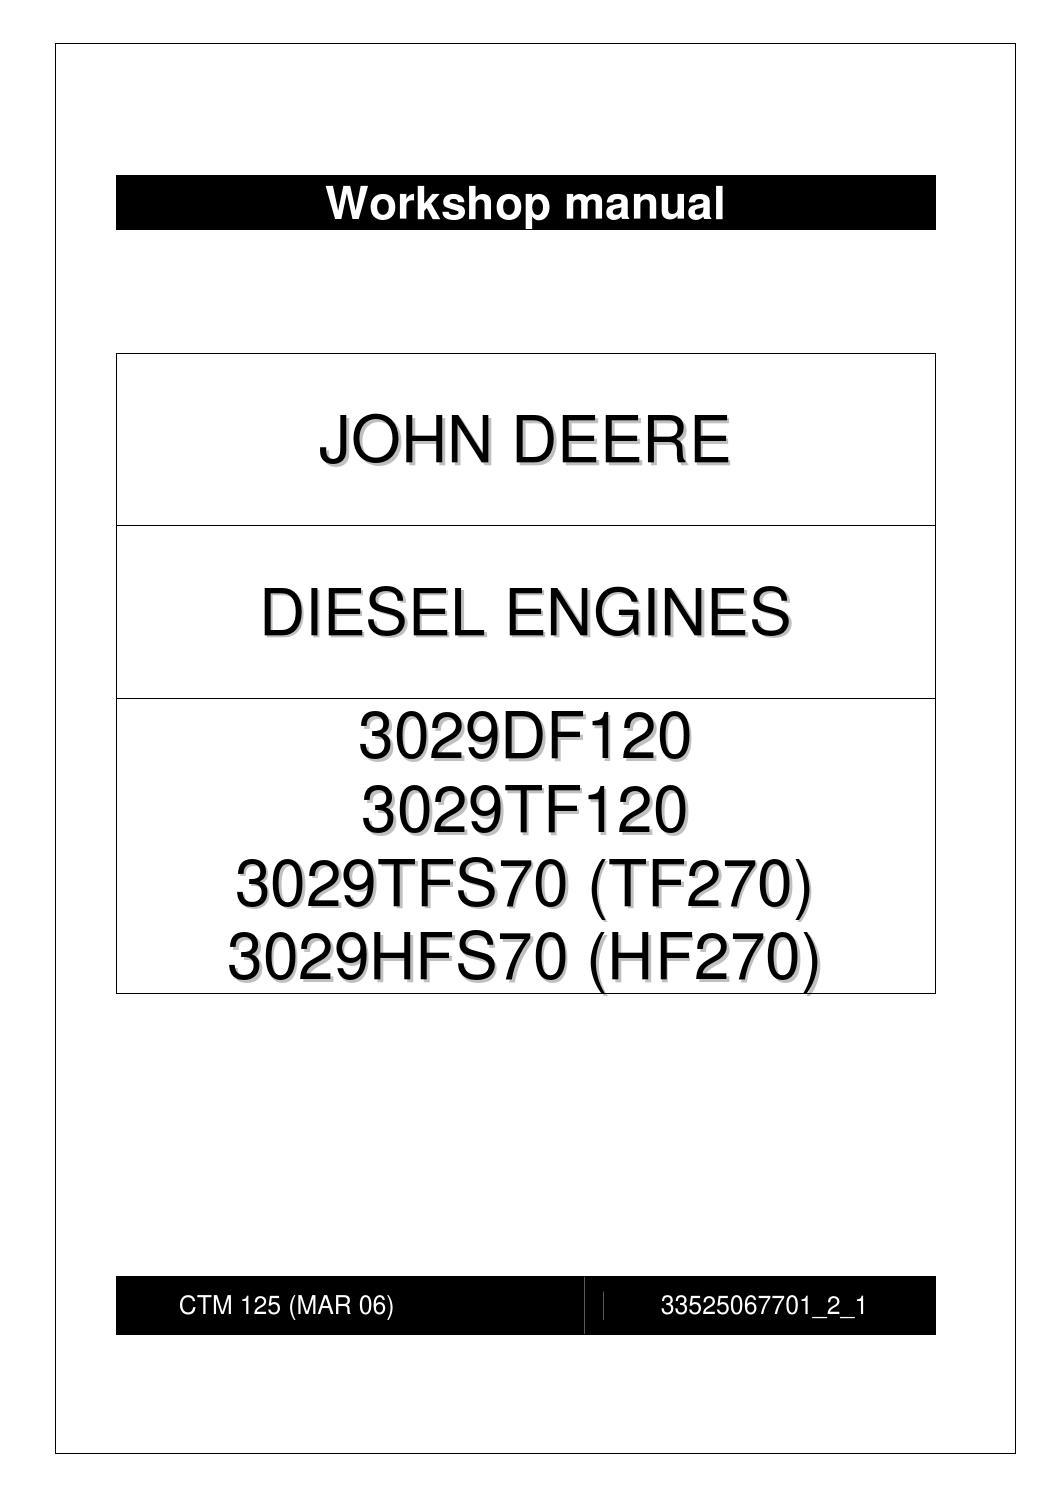 john deere 1445 series 2 service manual pdf